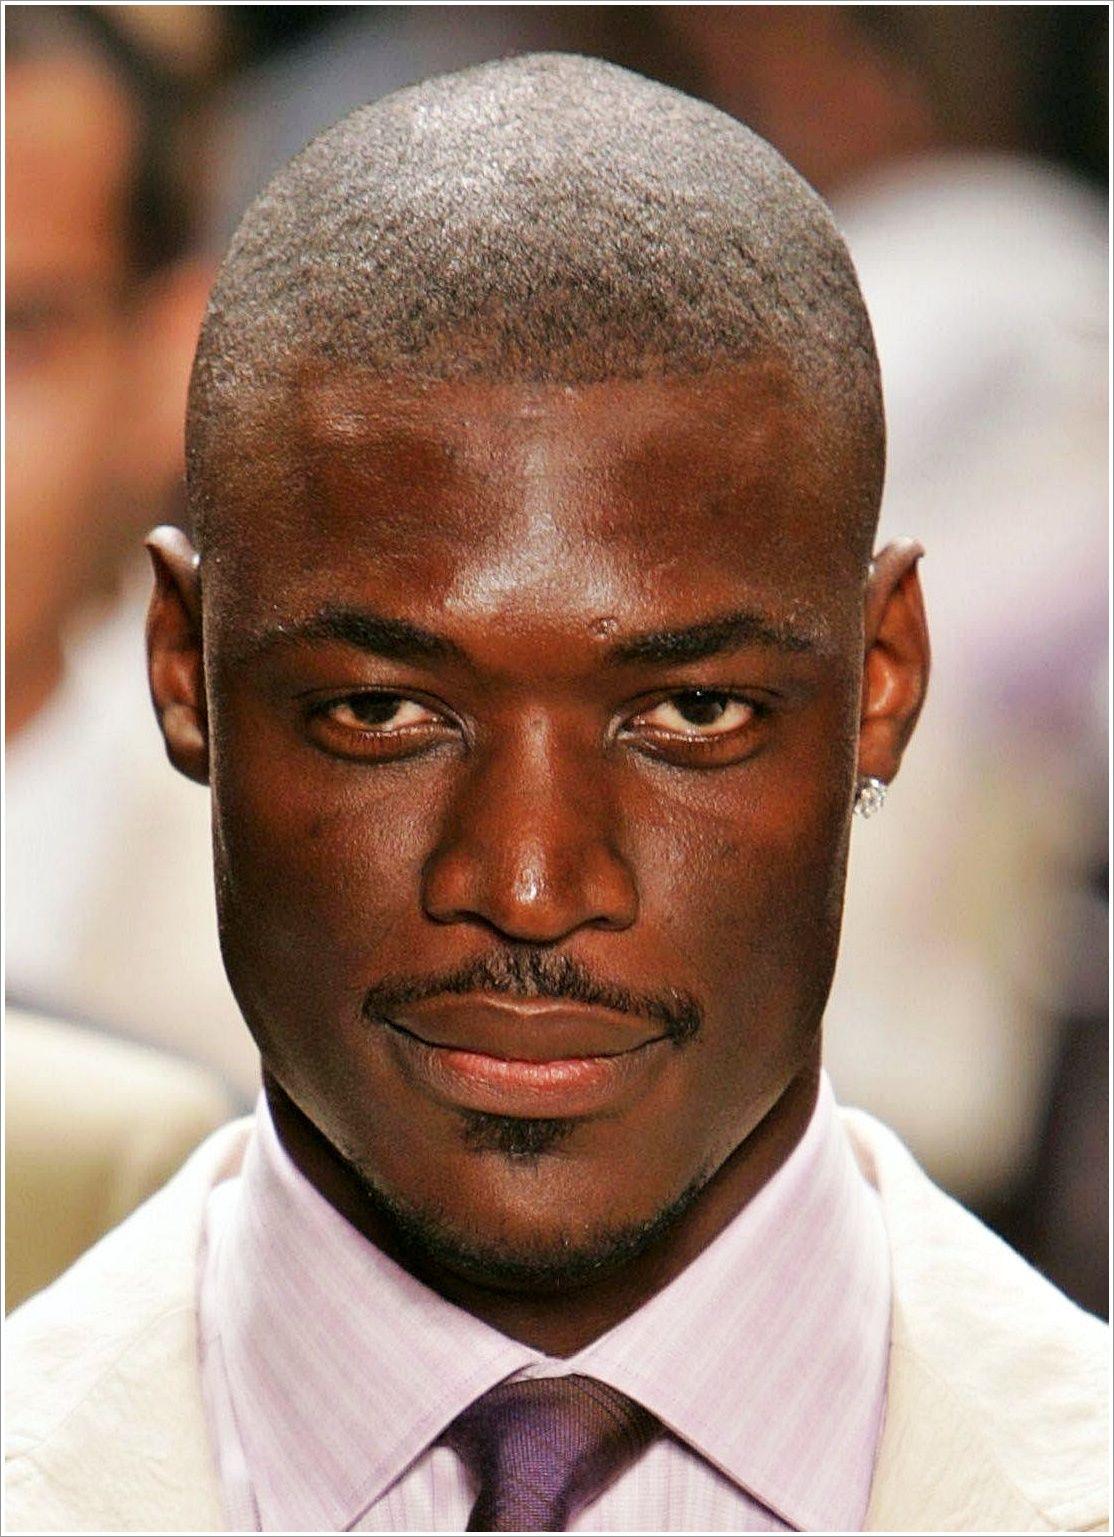 fine hairstyle 2014 black men wallpaper | black men